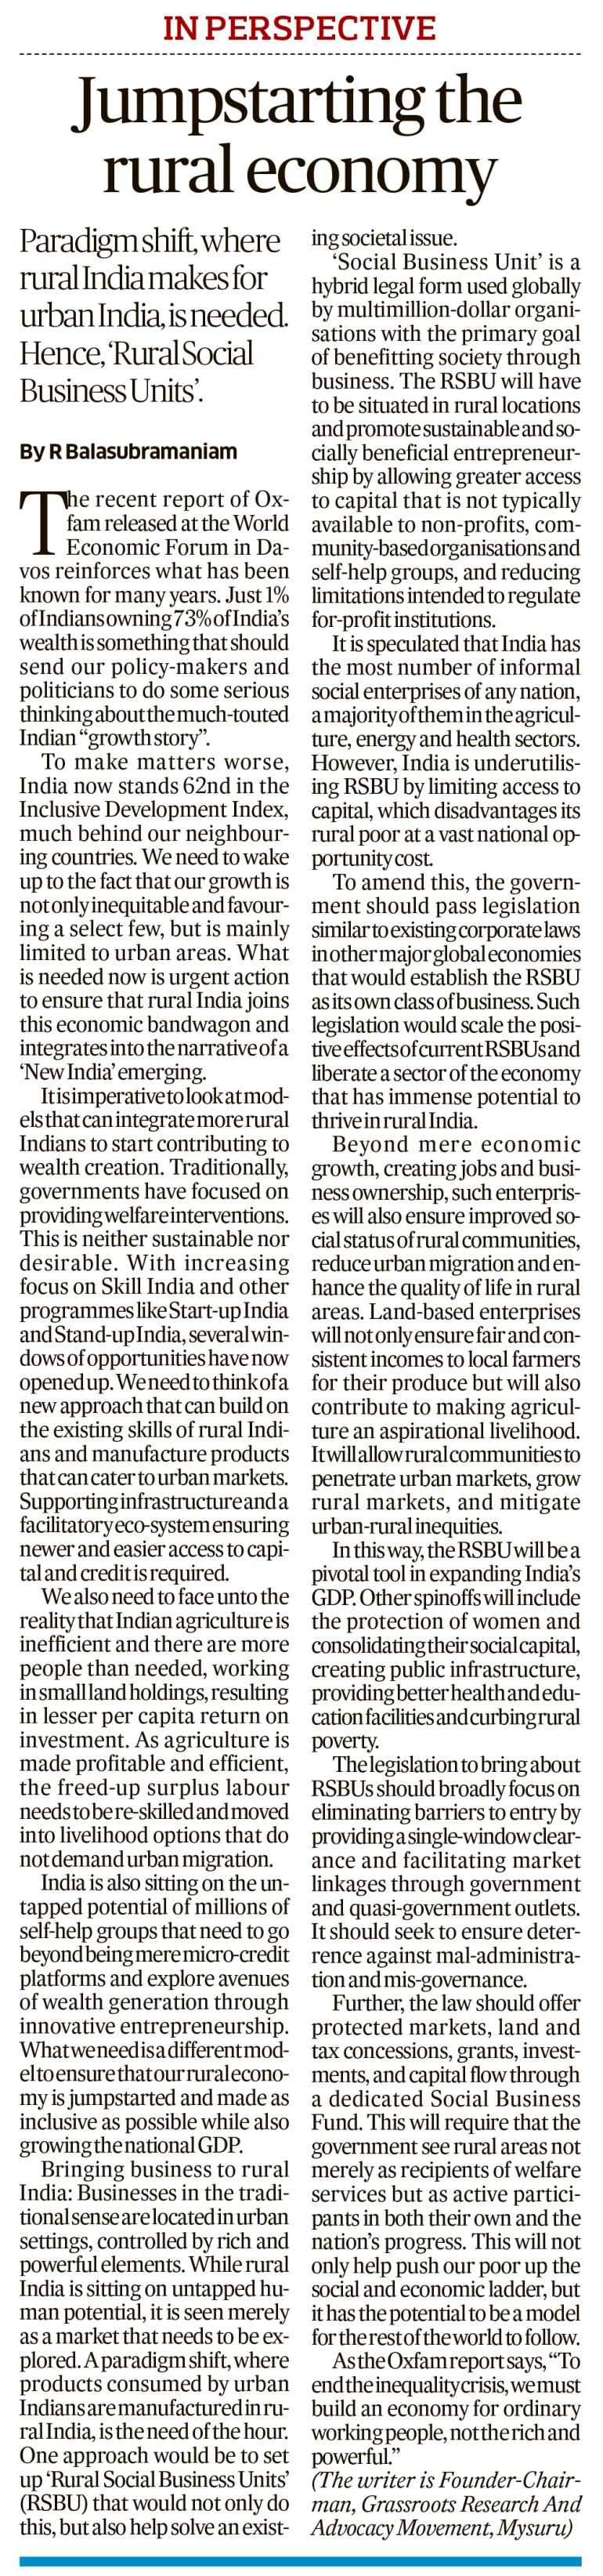 Jumpstarting the Rural EconomyJan18